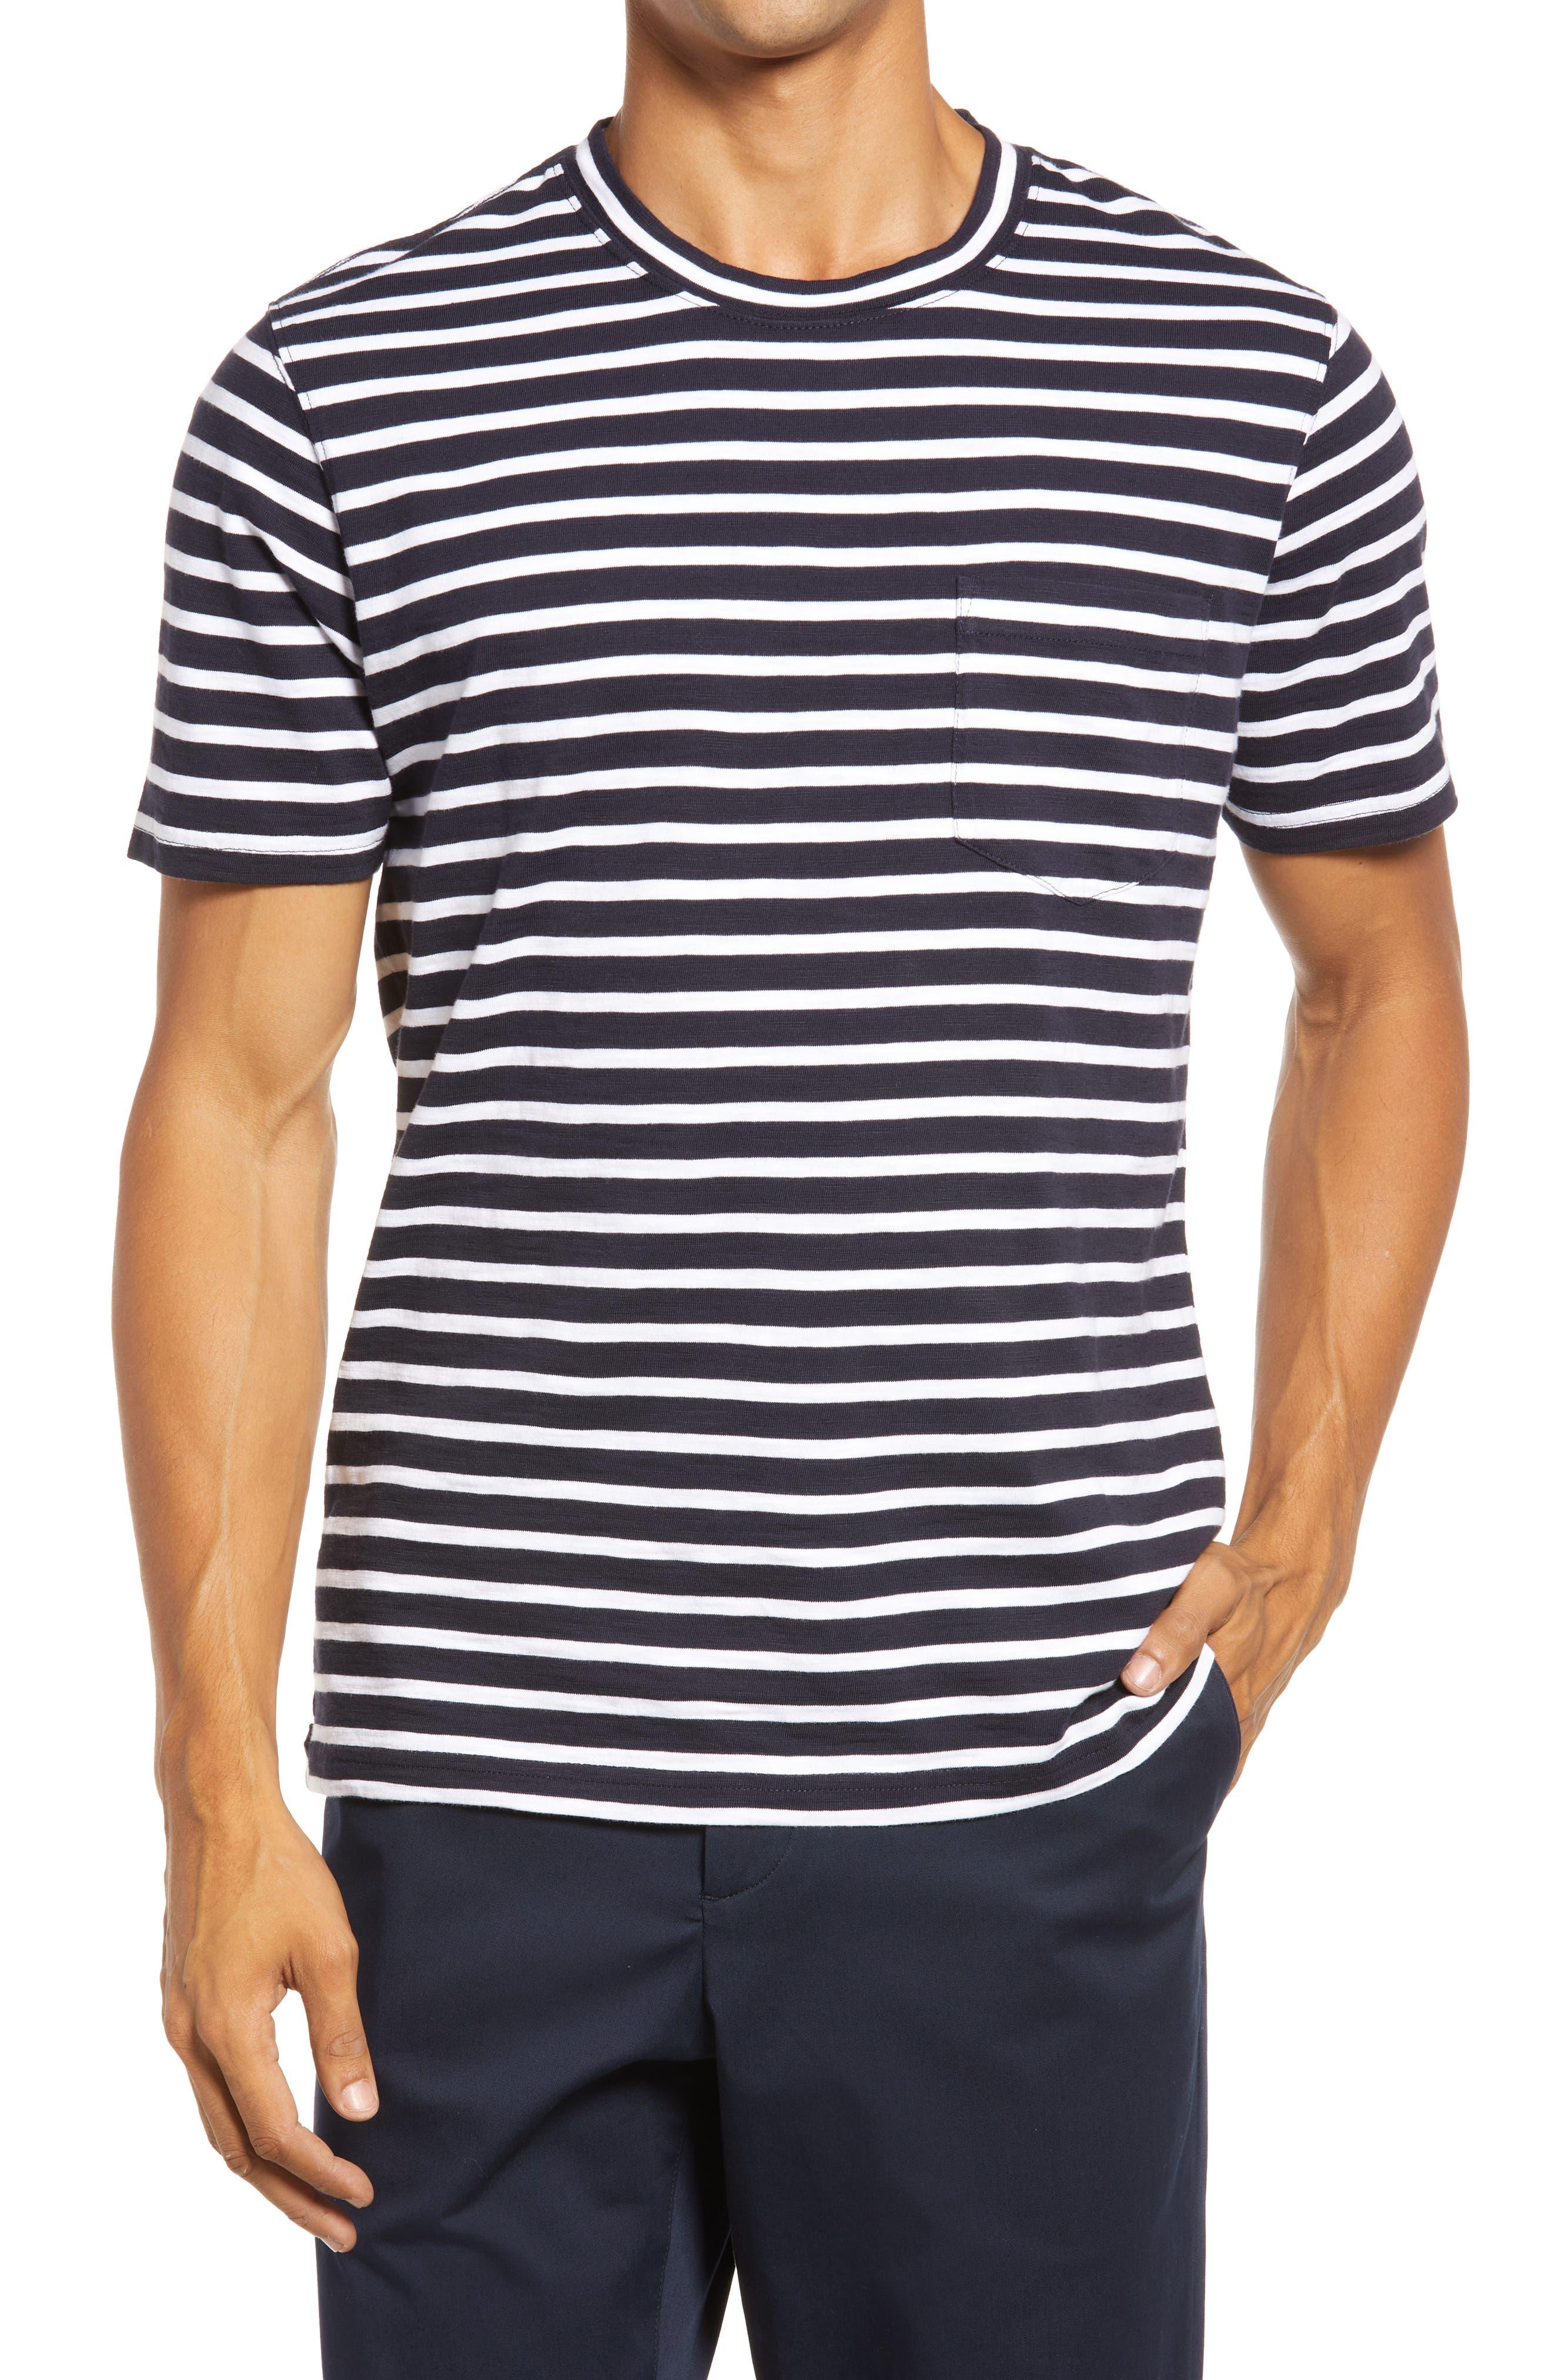 Men's Slub Stripe Pocket T-Shirt